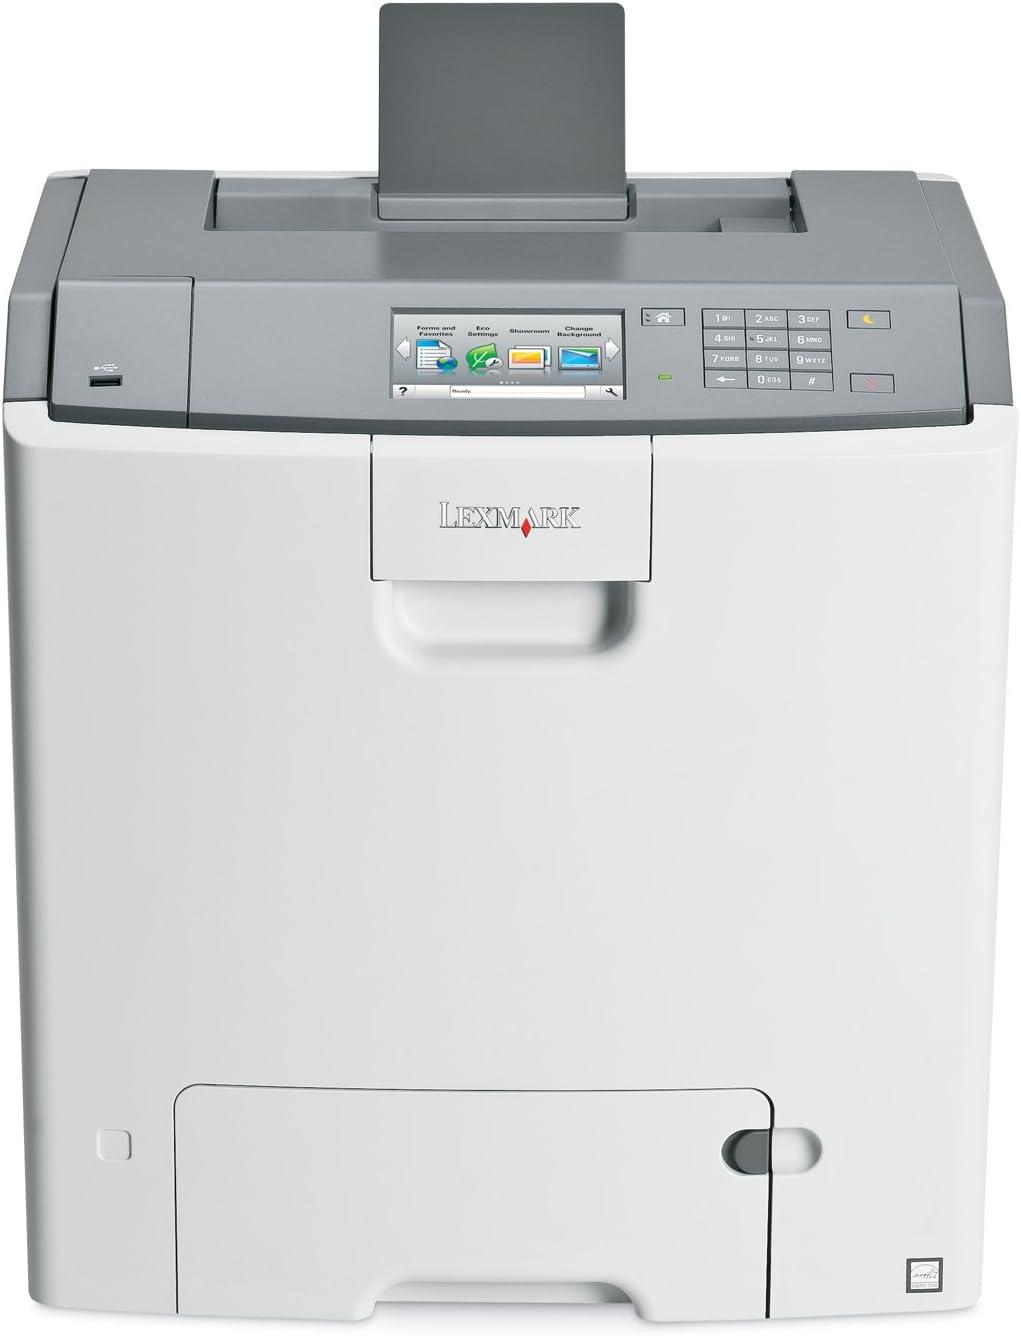 Lexmark 41H0050 (C748DE) Color Laser Printer